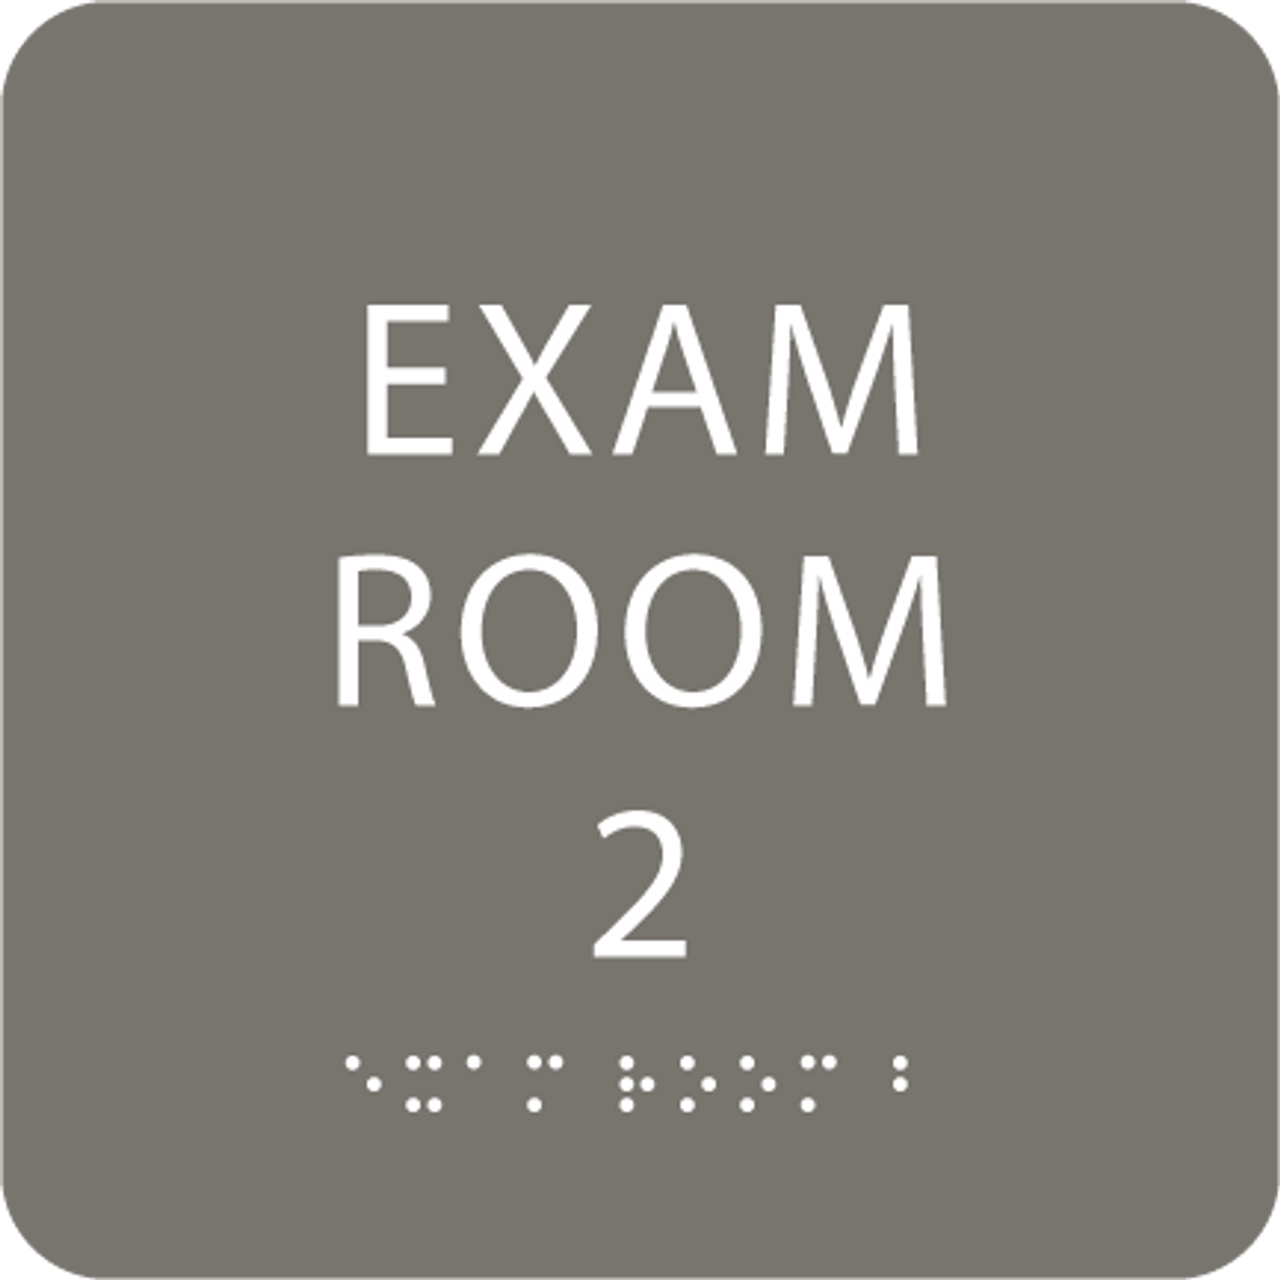 Dark Grey ADA Exam Room 2 Sign with Braille